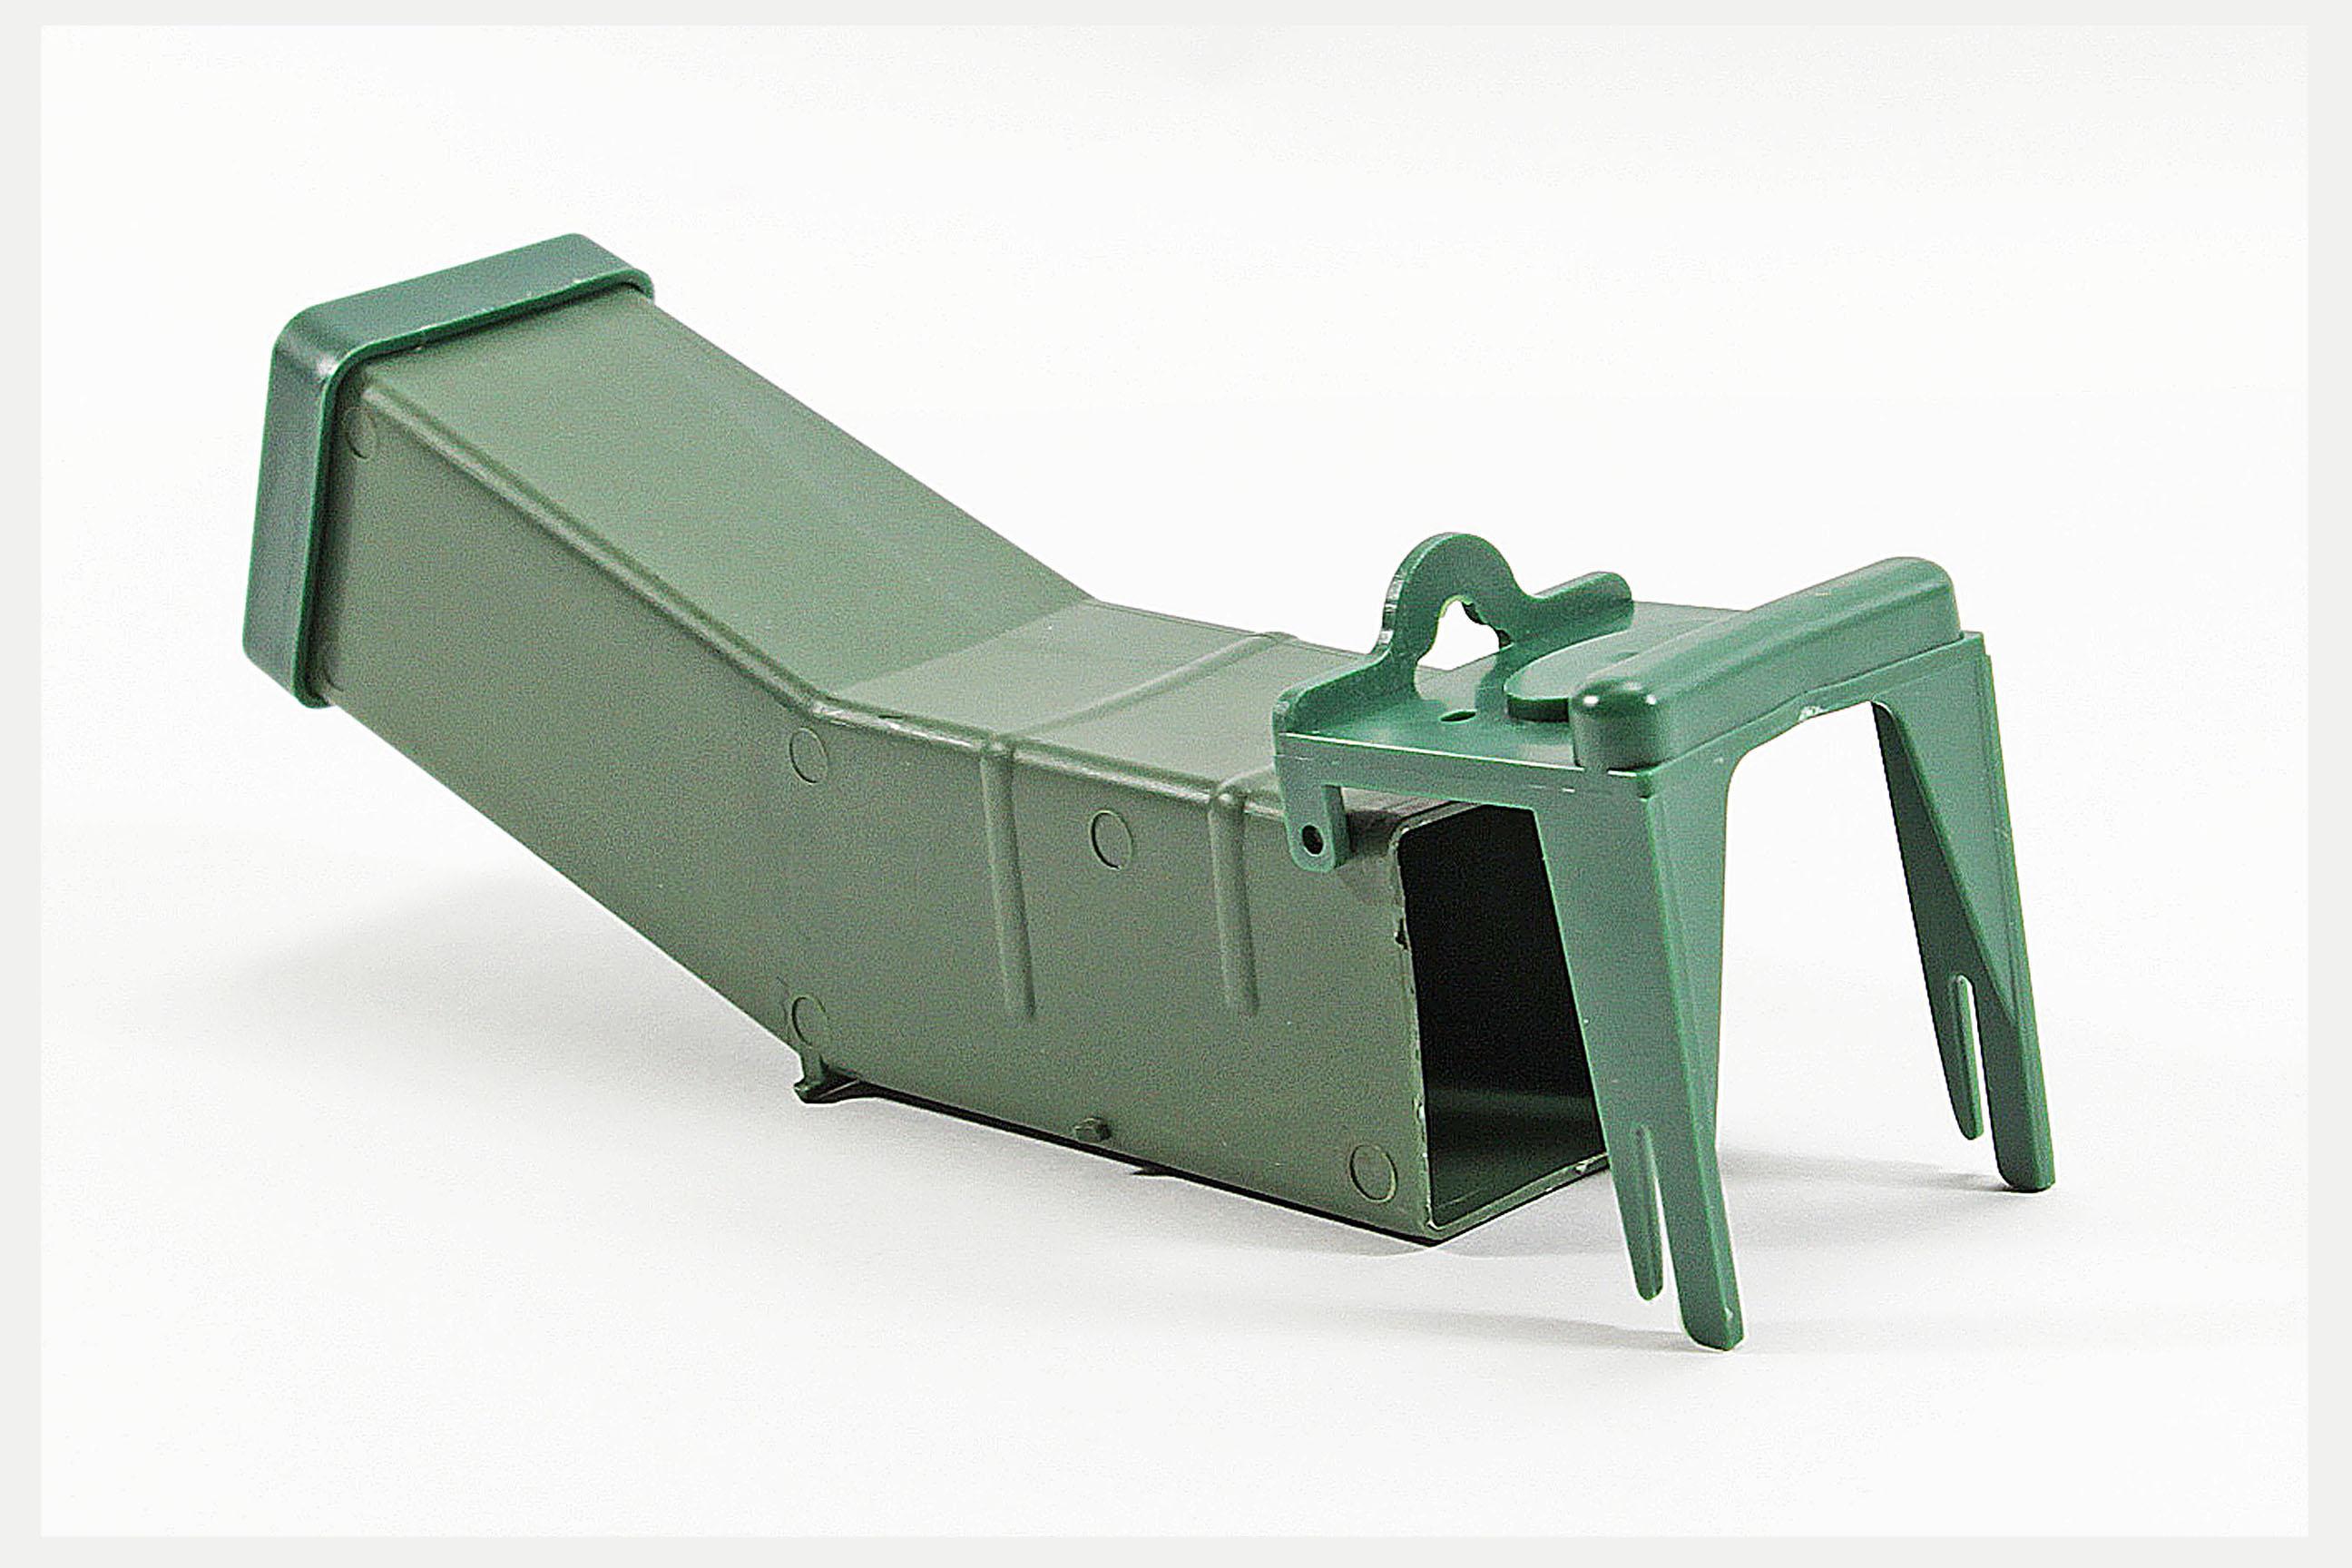 mausefalle tierfreundlich lebendfalle maus falle m usebek mpfung ohne gift ebay. Black Bedroom Furniture Sets. Home Design Ideas